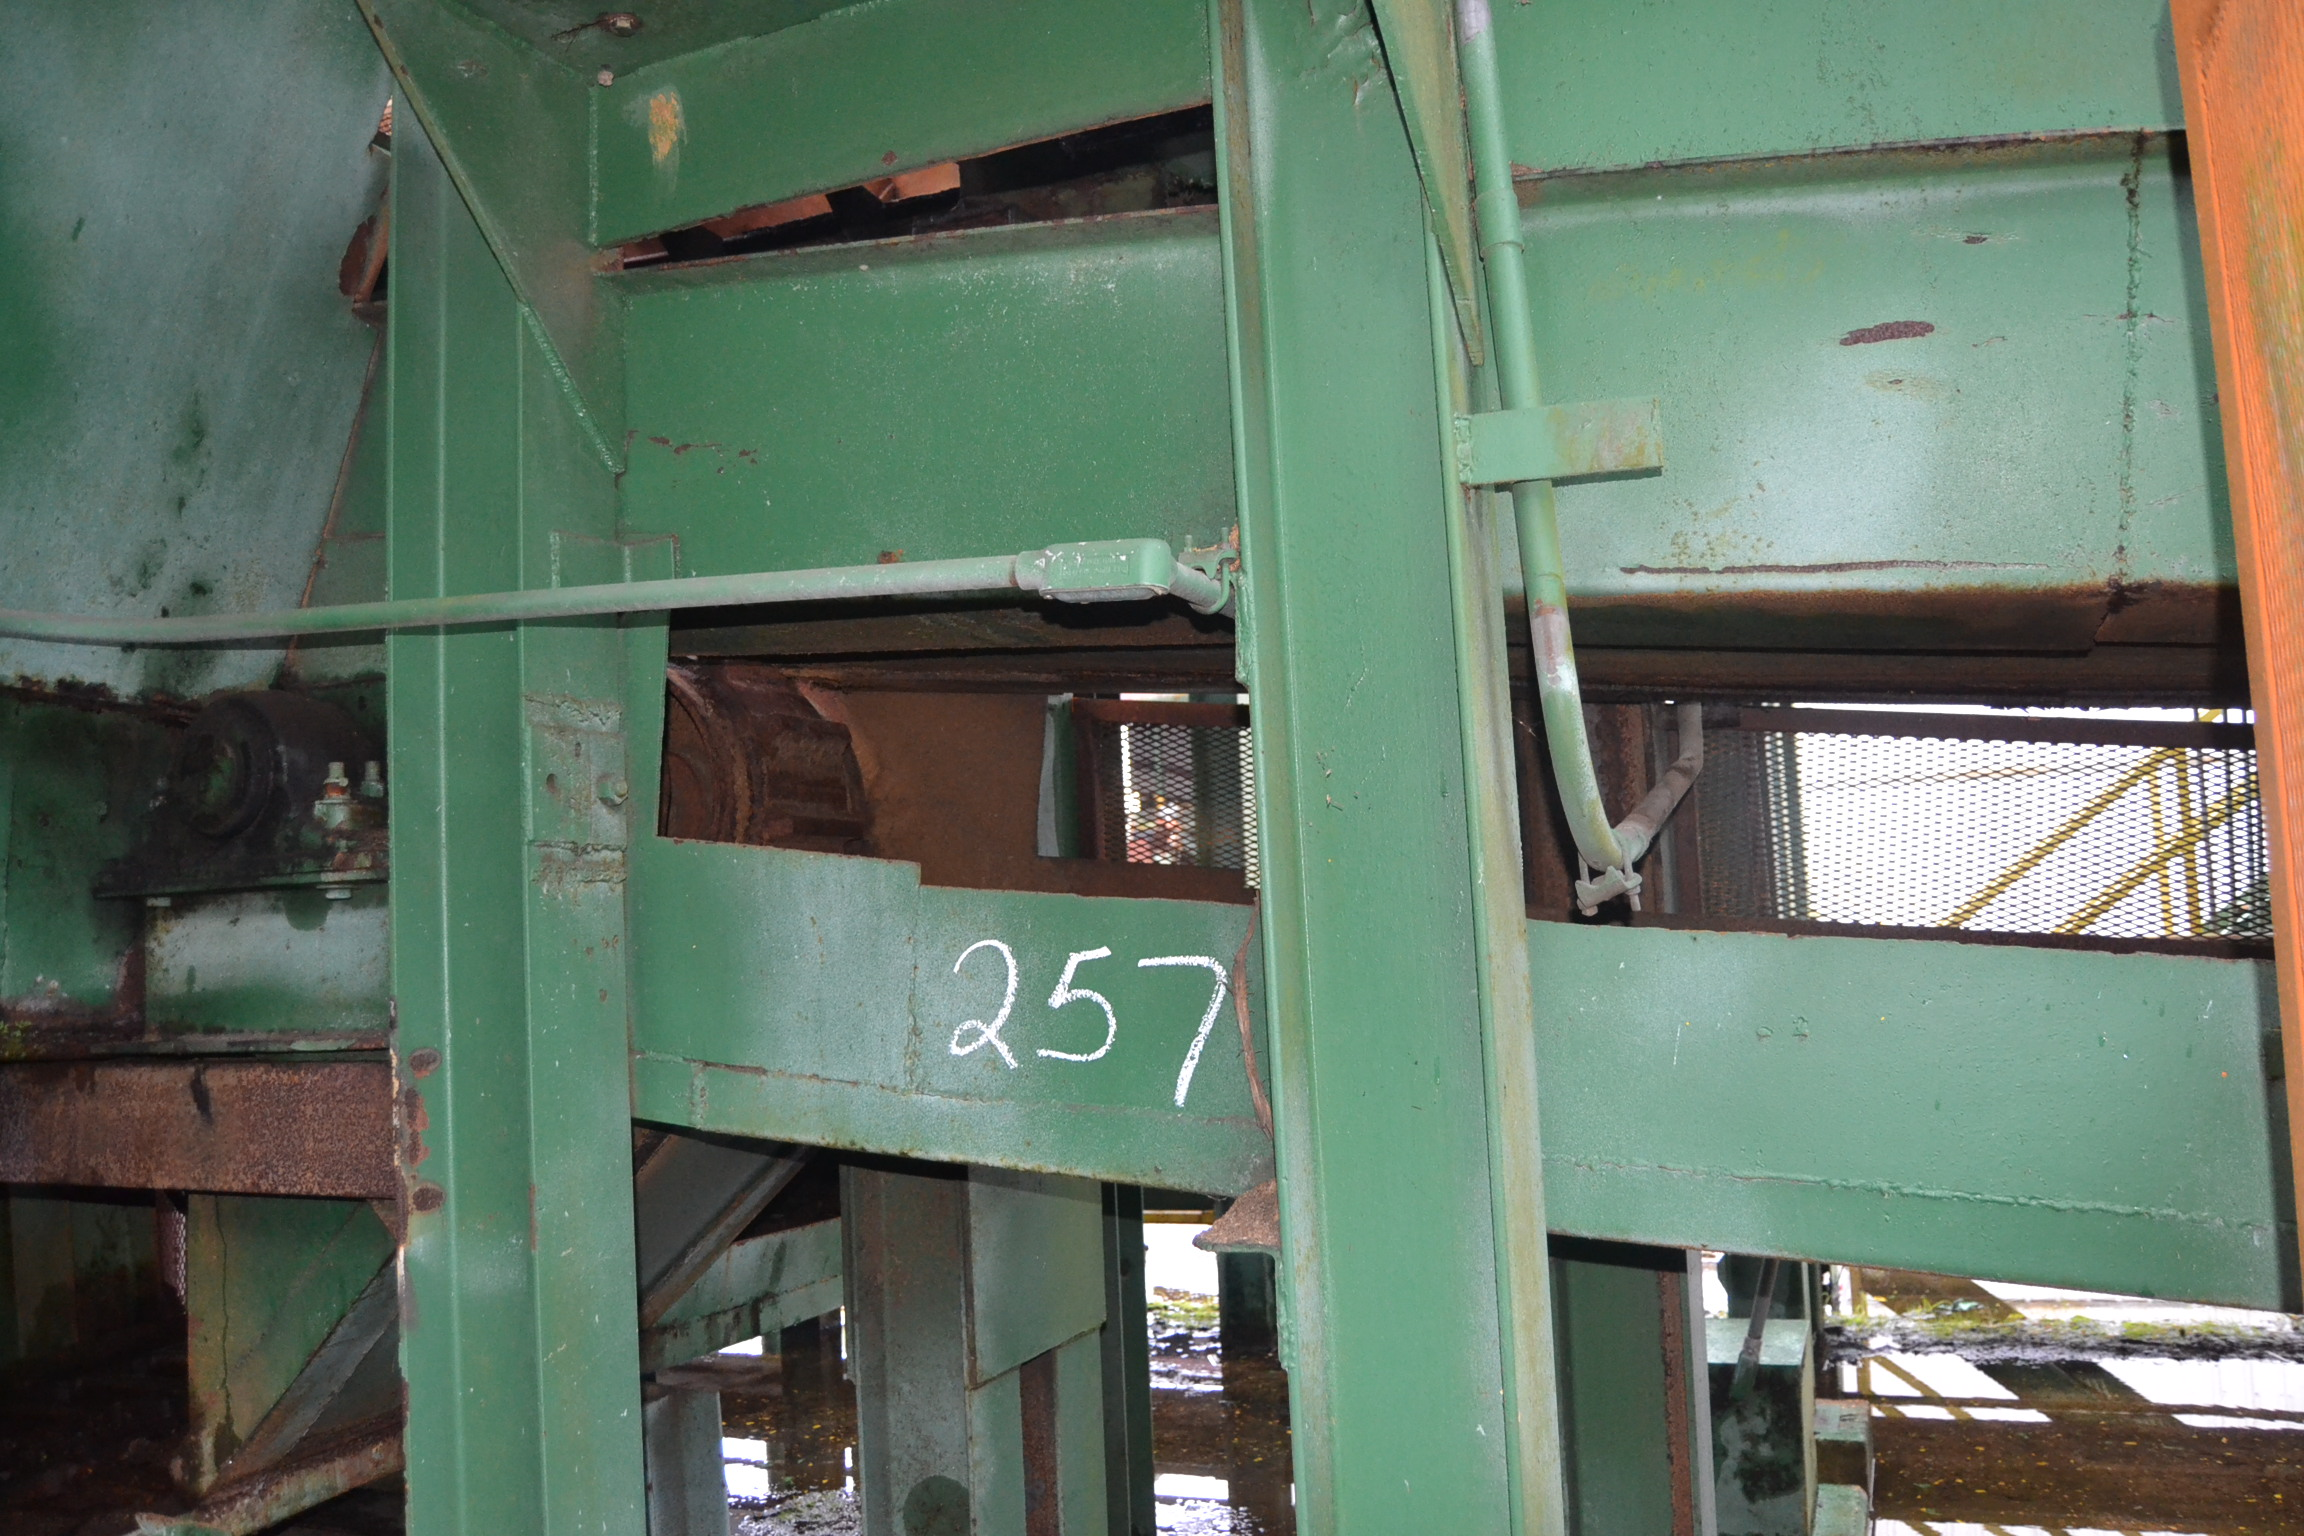 Lot 257 - 50' ALL STEEL WASTE CONVEYOR W/ DOUBLE LADDER BACK CHAIN W/ DRIVE